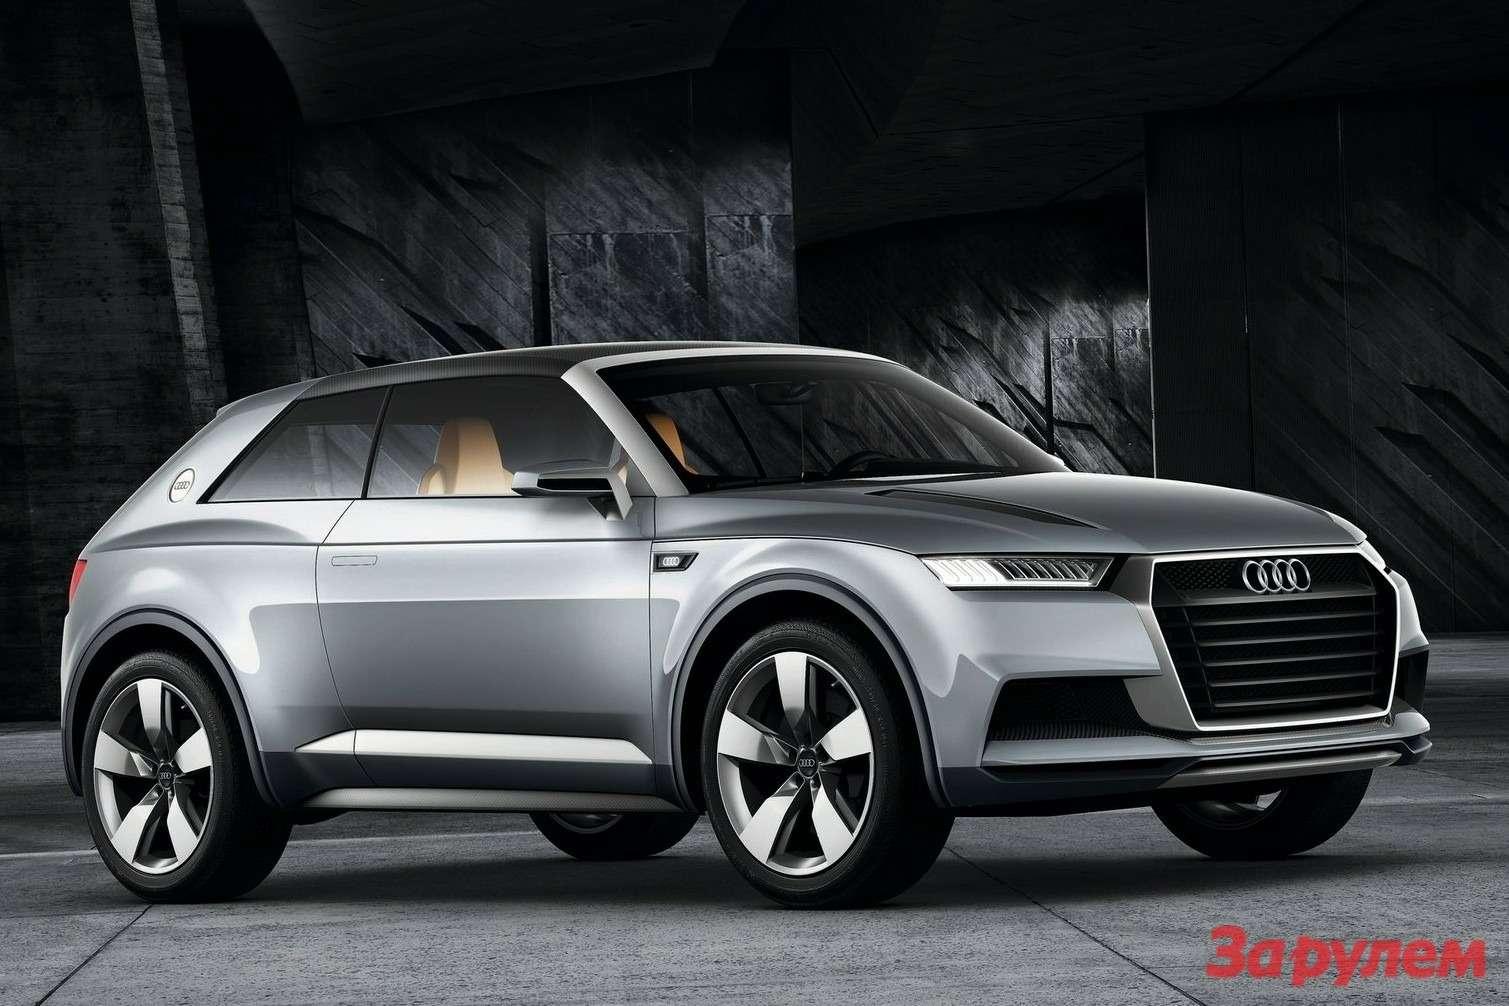 Audi Crosslane Coupe Concept 2012 1600x1200 wallpaper 04